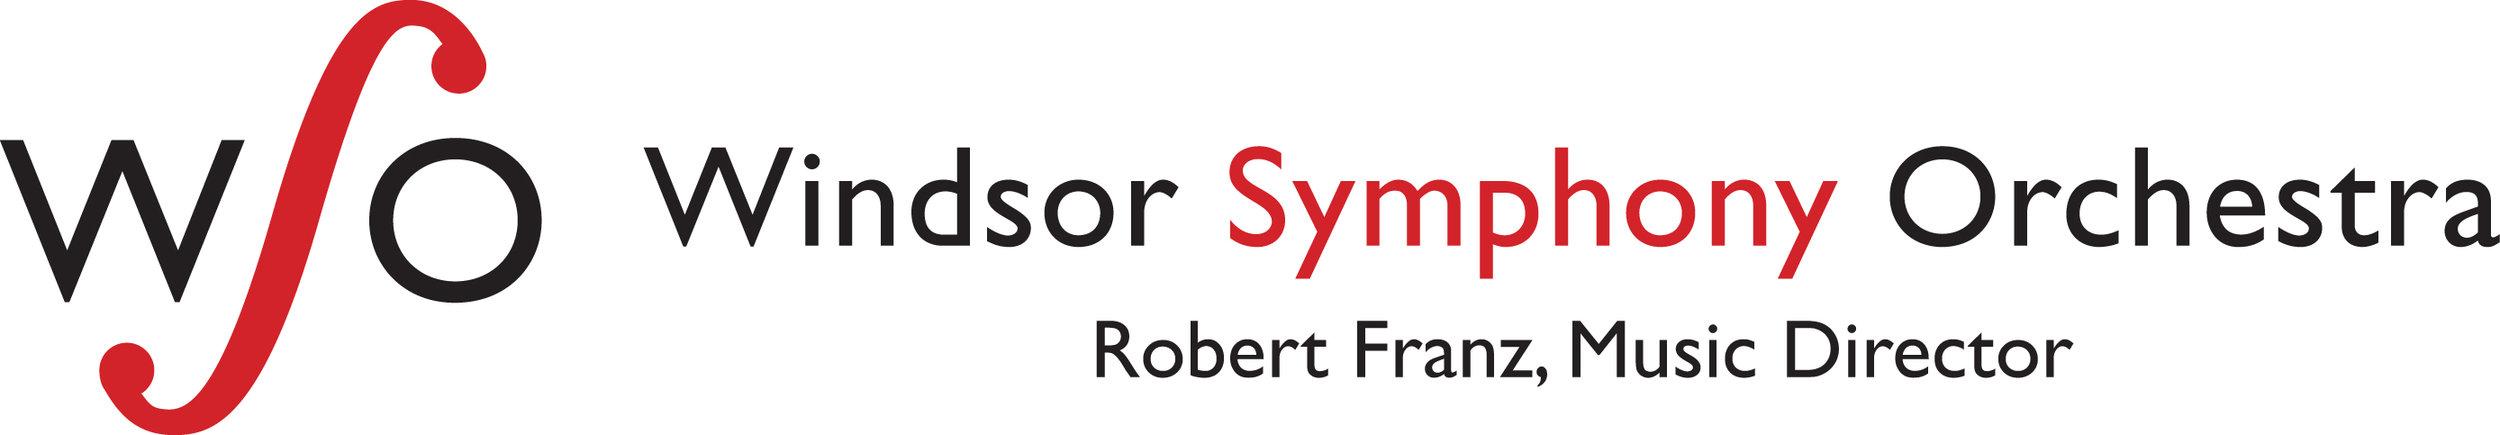 WSO-logo-long-rf.jpg